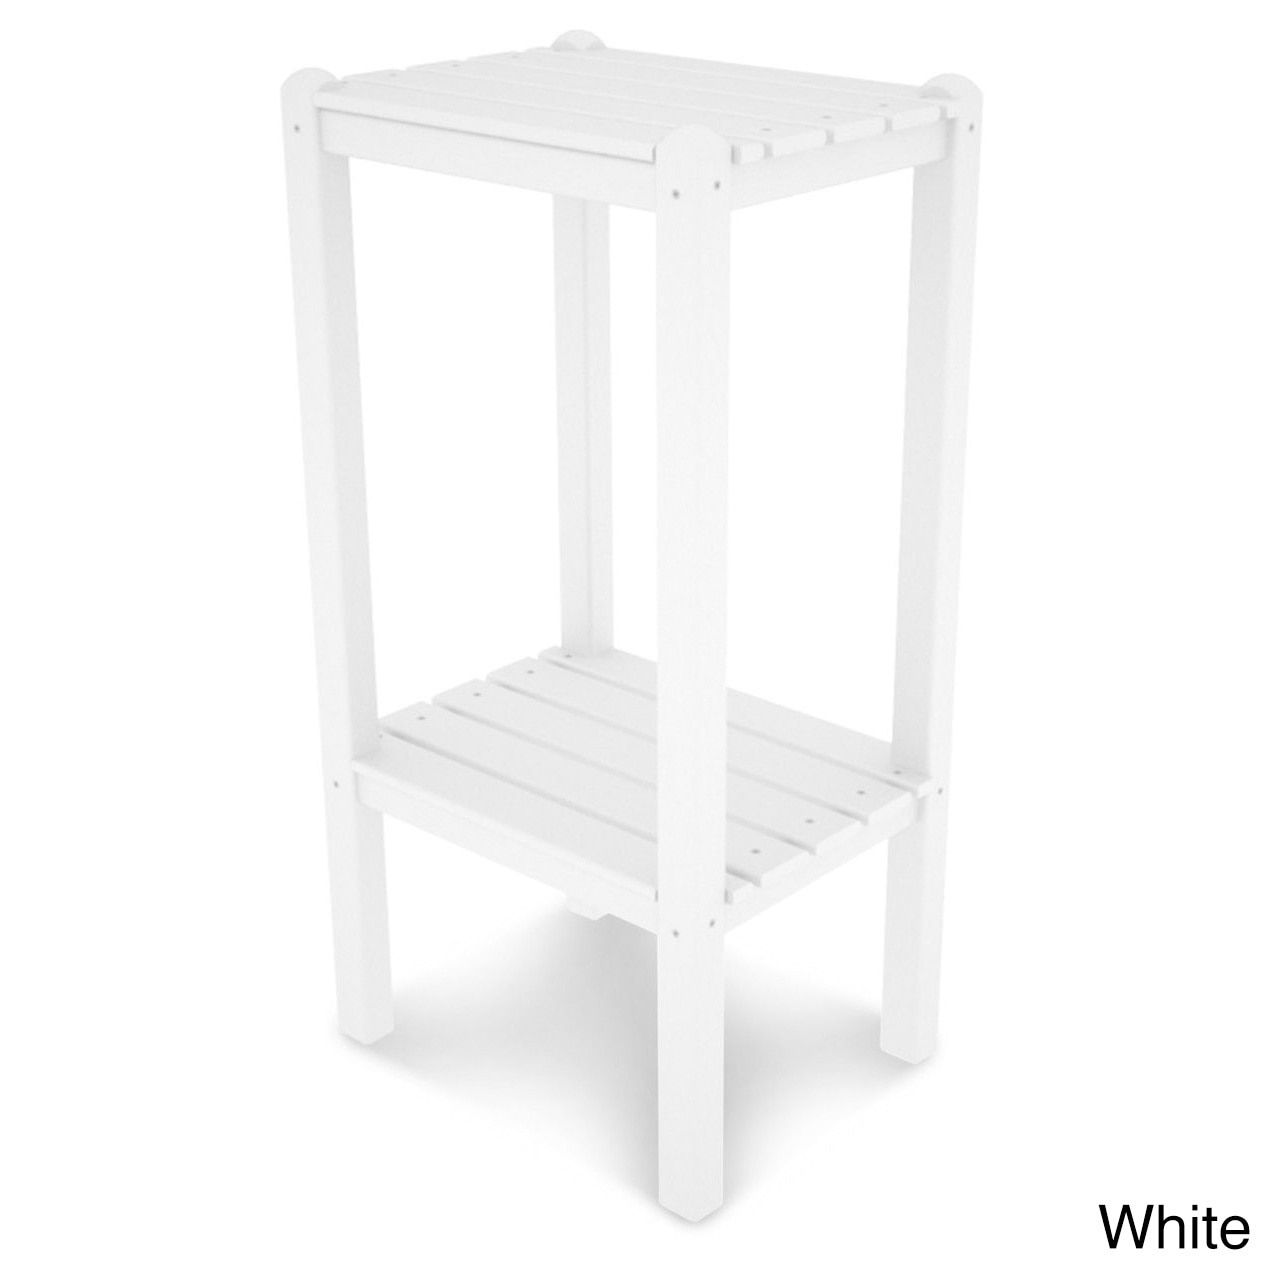 Polywood Two Shelf Bar Side Table, Patio Furniture